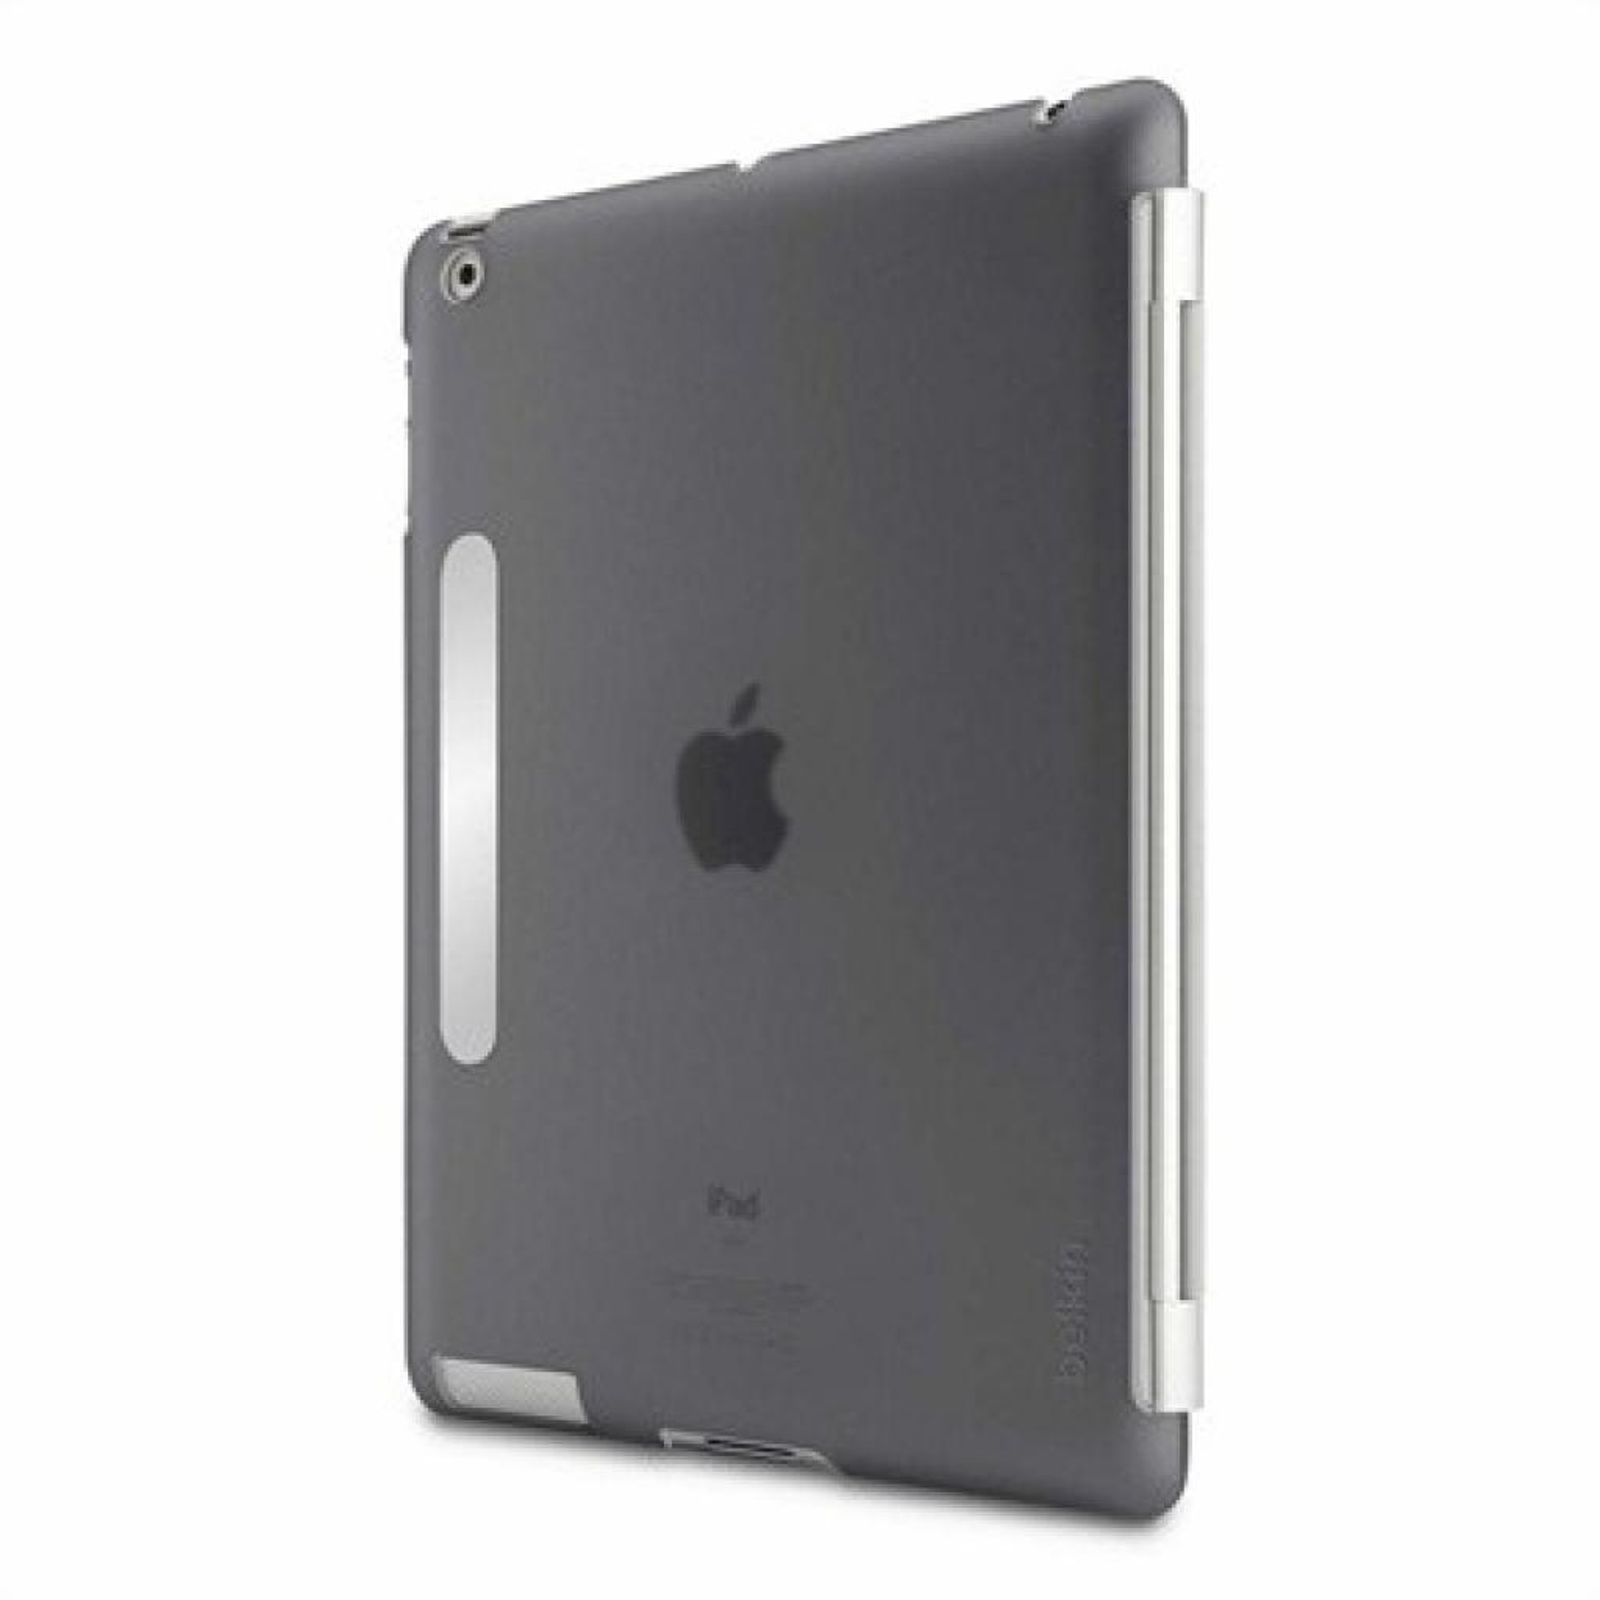 Чехол для планшета Belkin iPad2, iPad3, iPad4 Snap Shield Secure (Smoke) (F8N745cwC00)